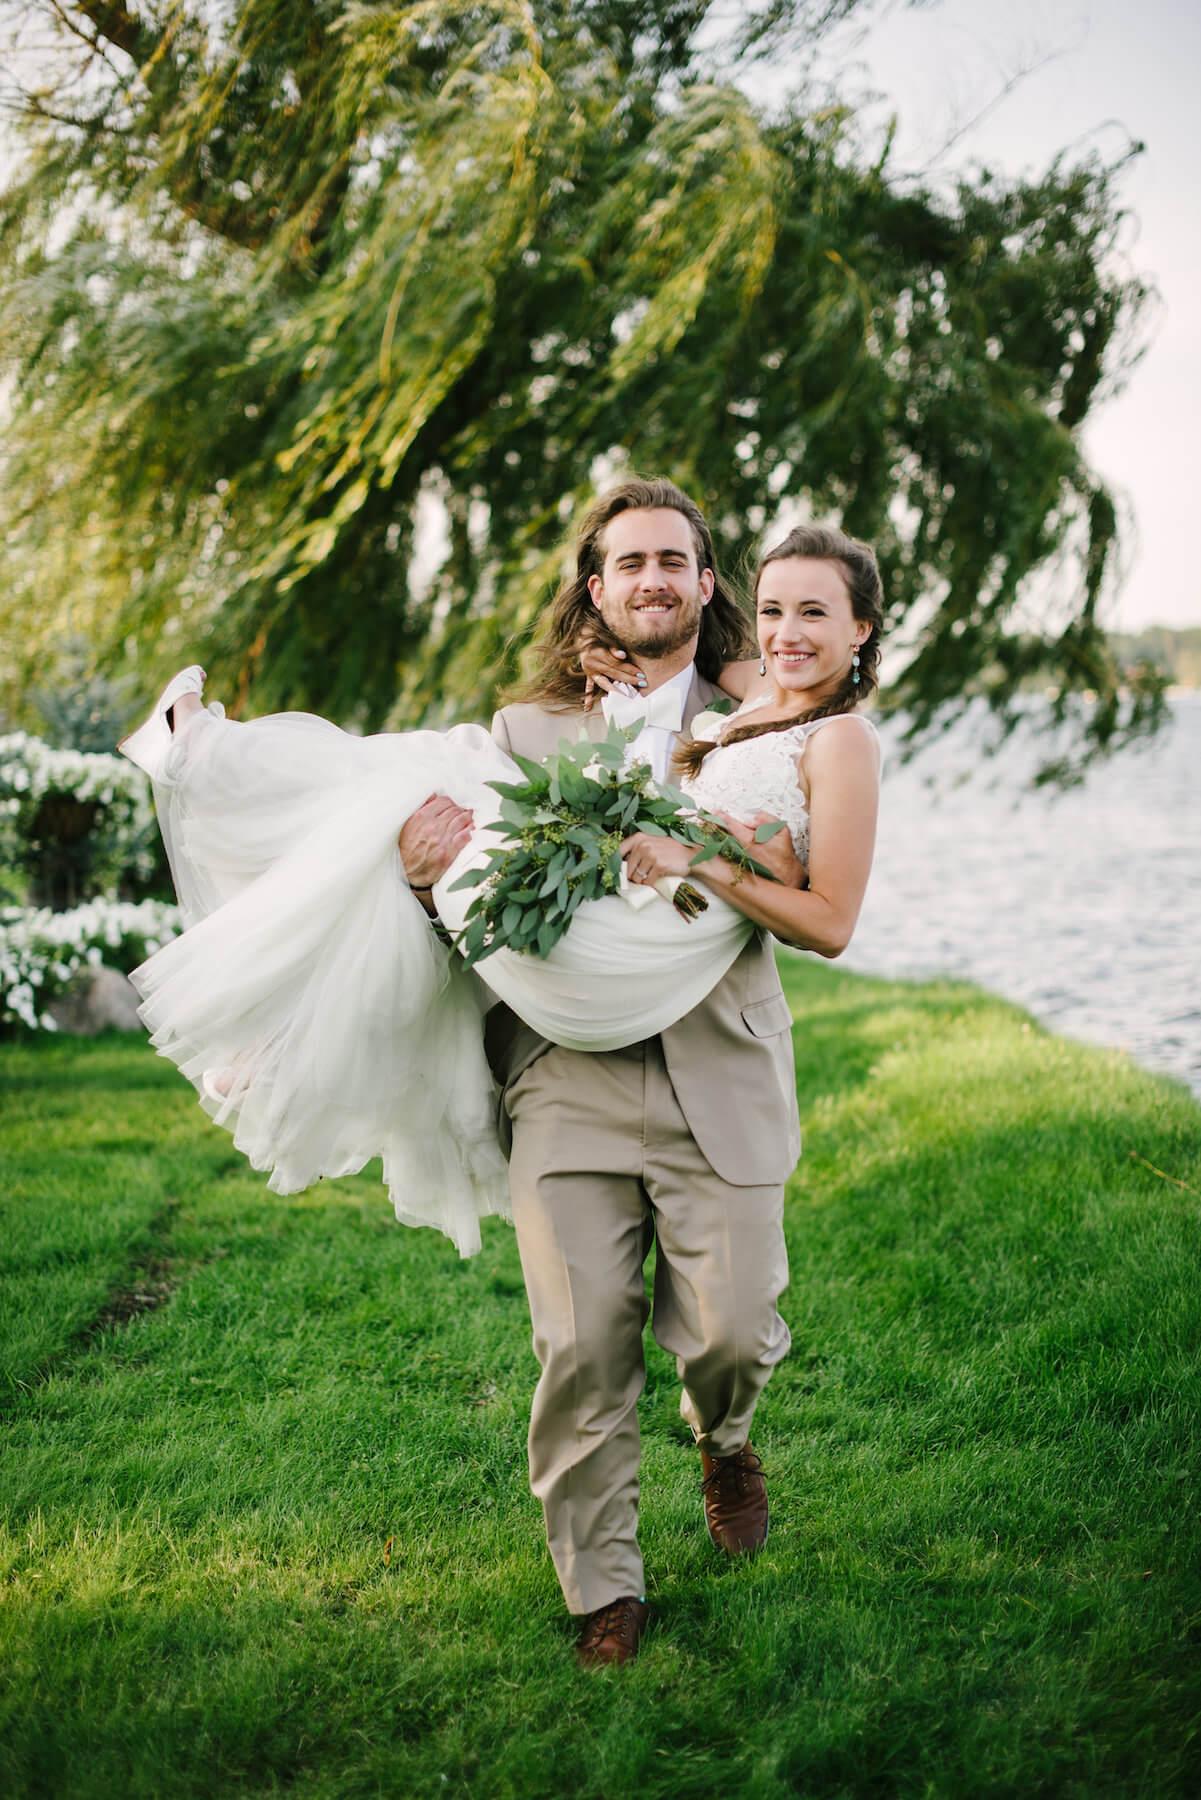 engle-olson-wedding-blair-taylor-38.jpg